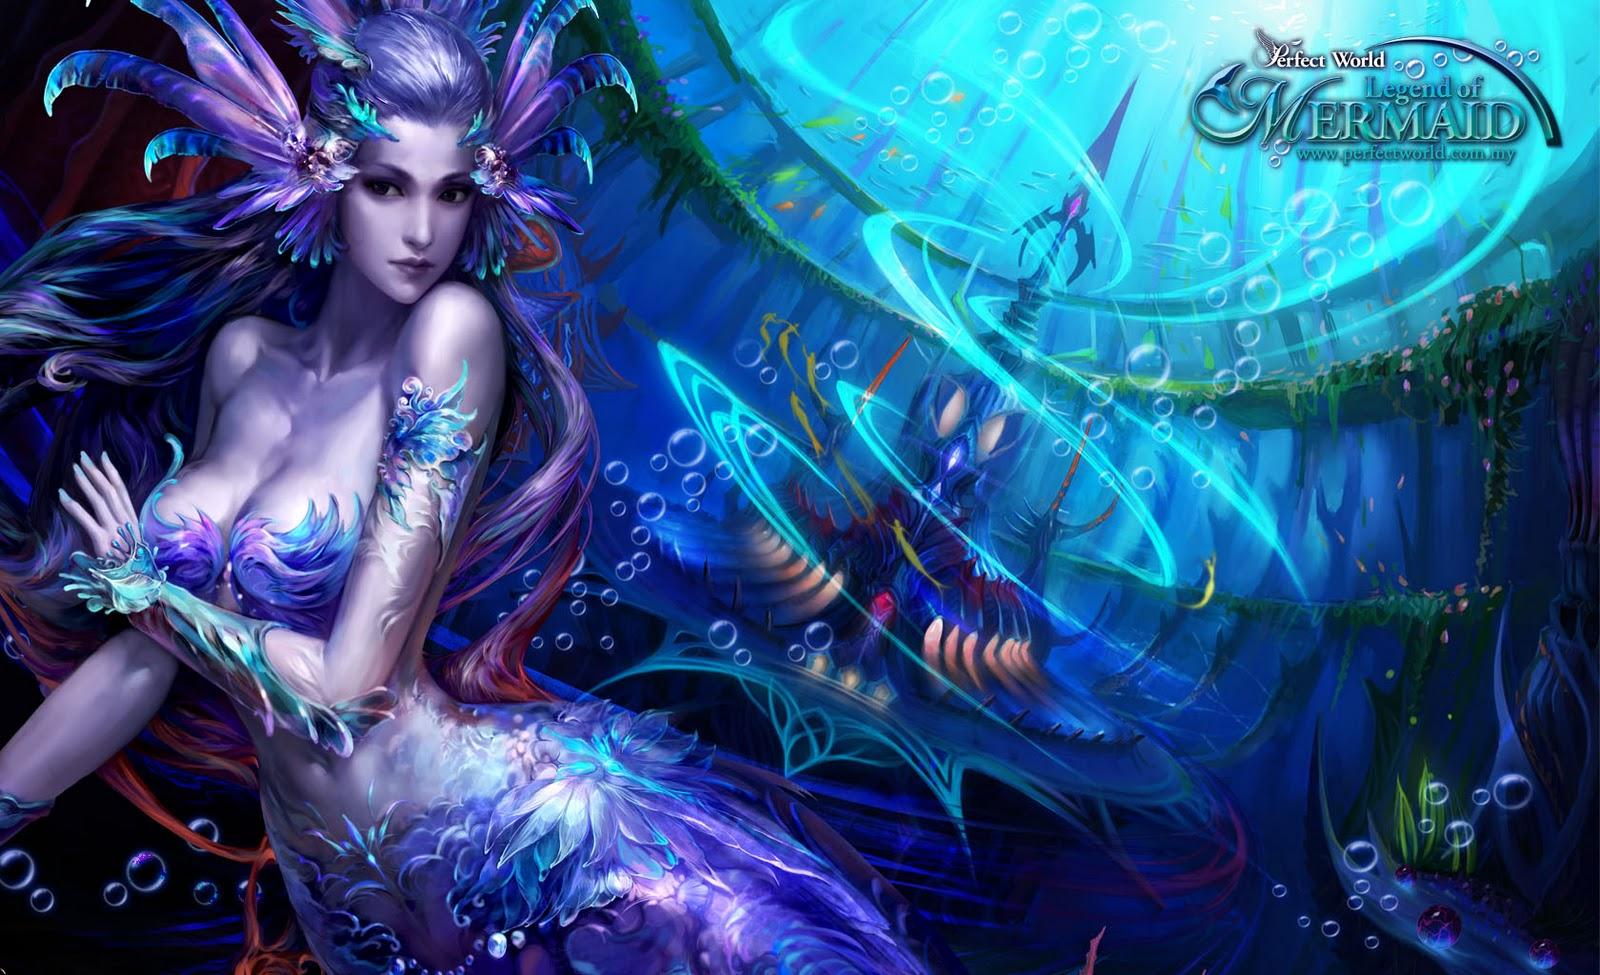 Neud anime mermaid pictures hentia galleries